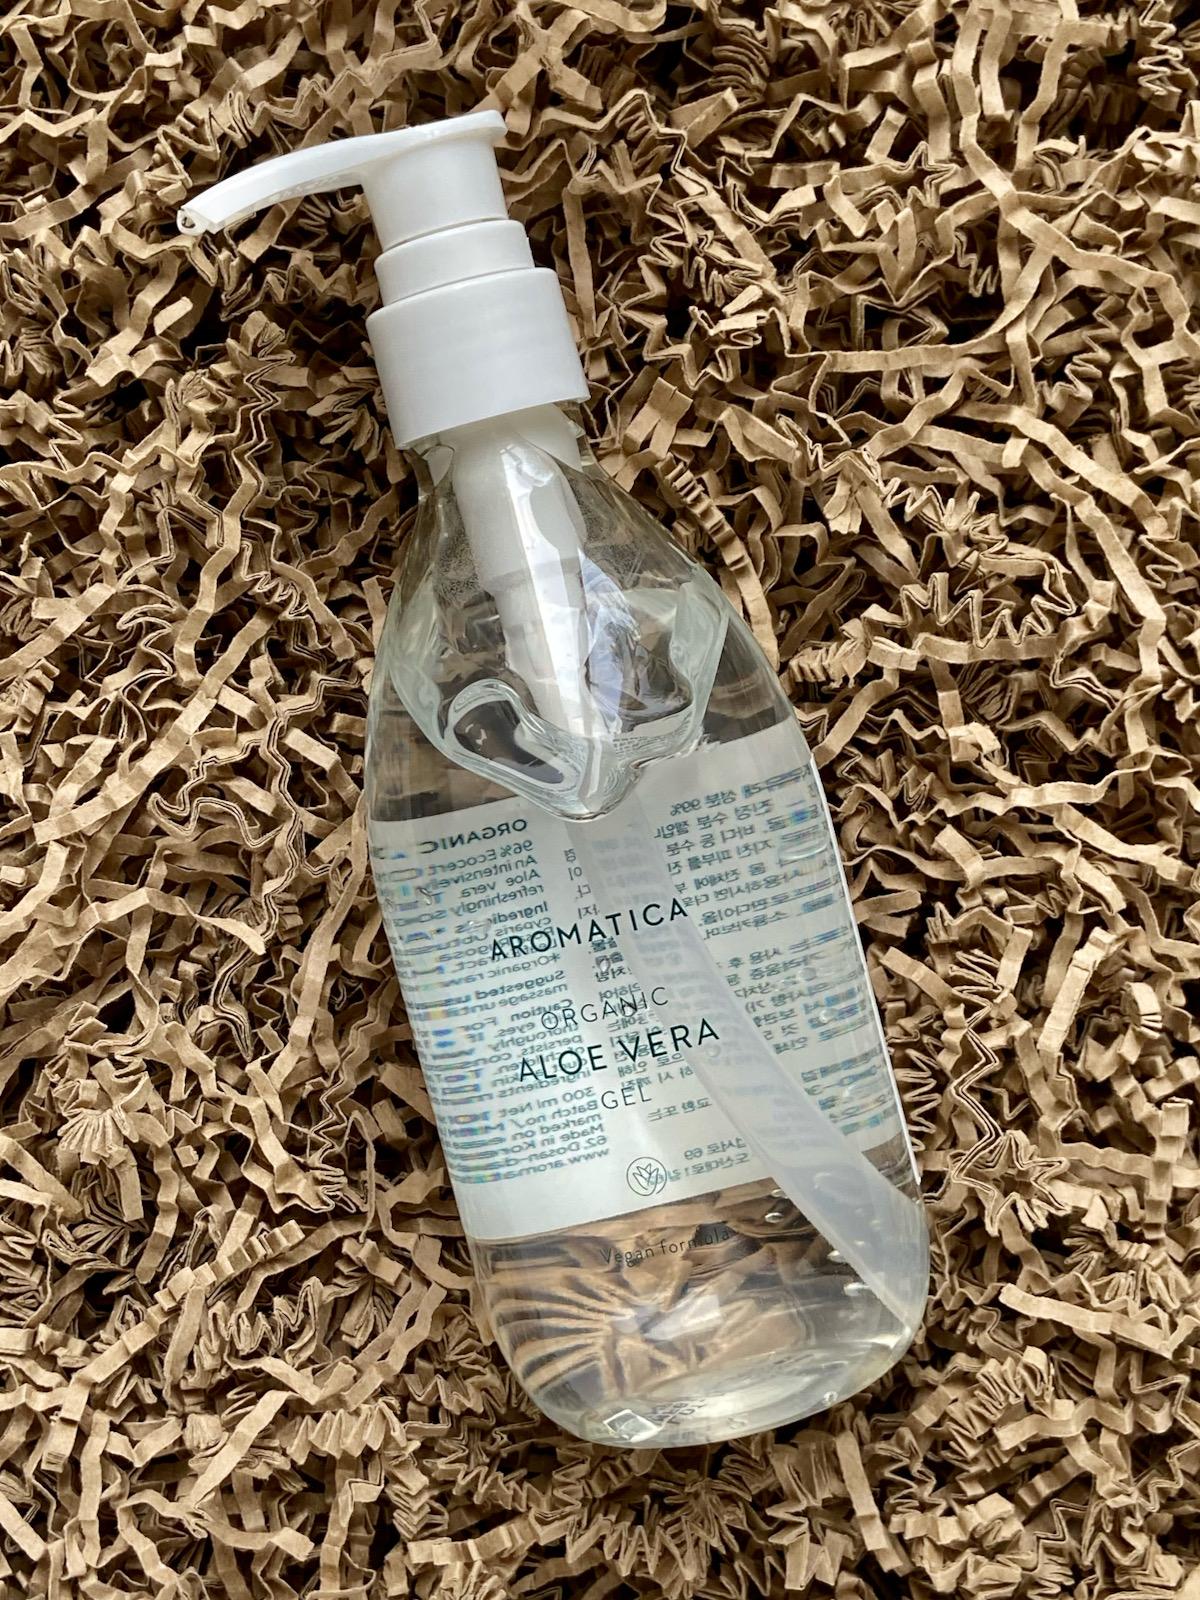 Aromatica Organic Aloe Vera Gel